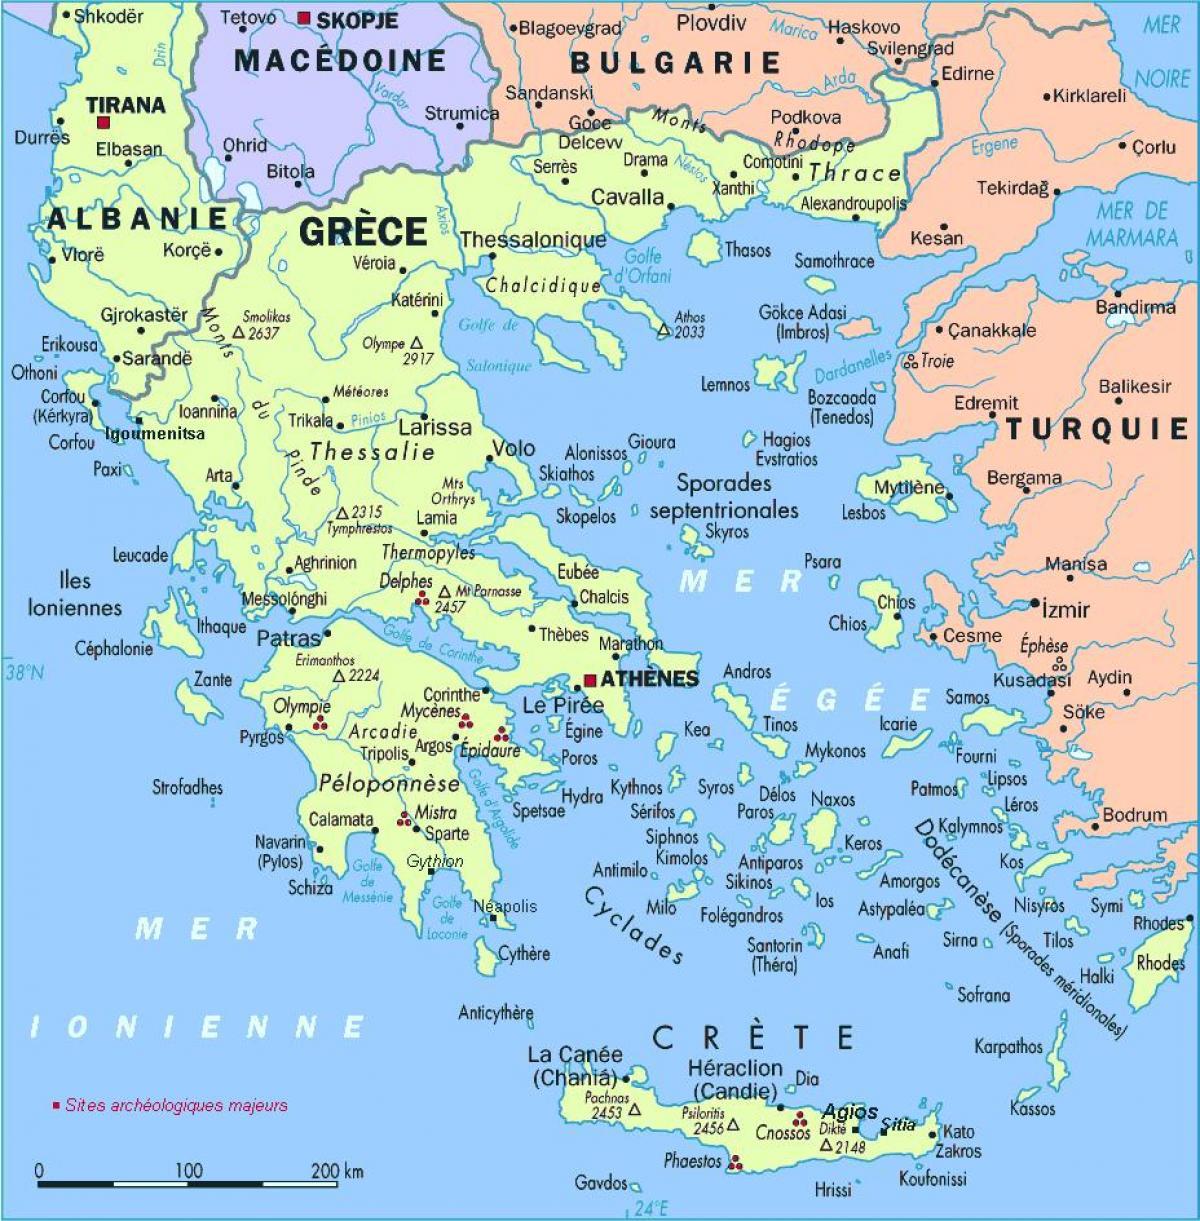 Recko Ostrovy Mapa Mapa Recko S Ostrovy Jizni Evropa Evropa